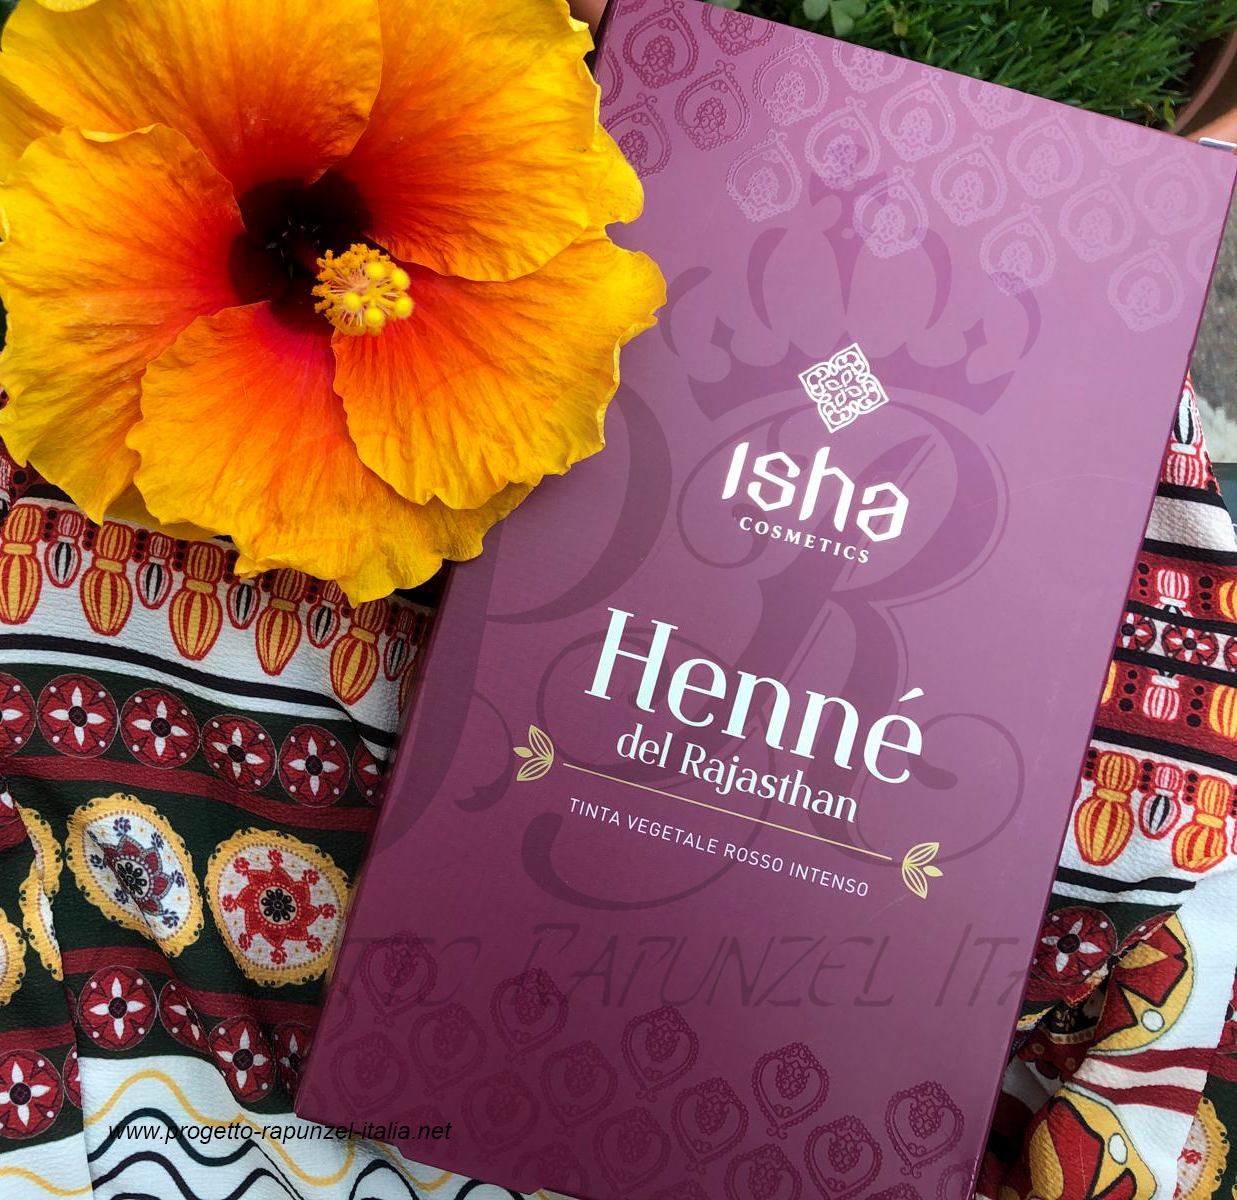 ISHA Cosmetics Henne de Rajasthan